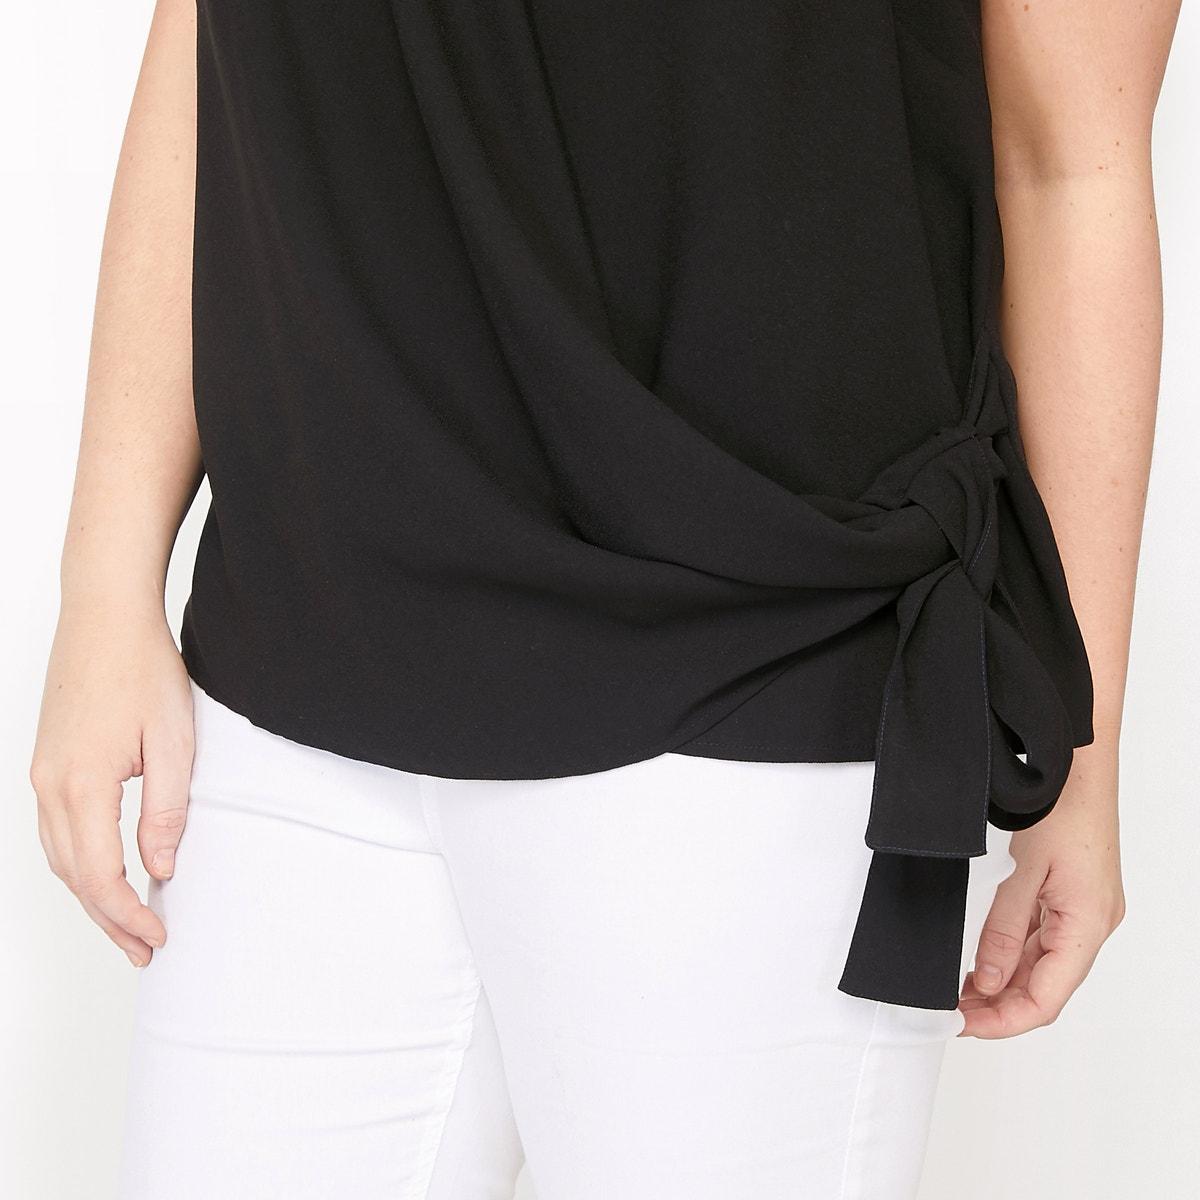 Castaluna-Womens-Sleeveless-Blouse-With-Tie-Panel